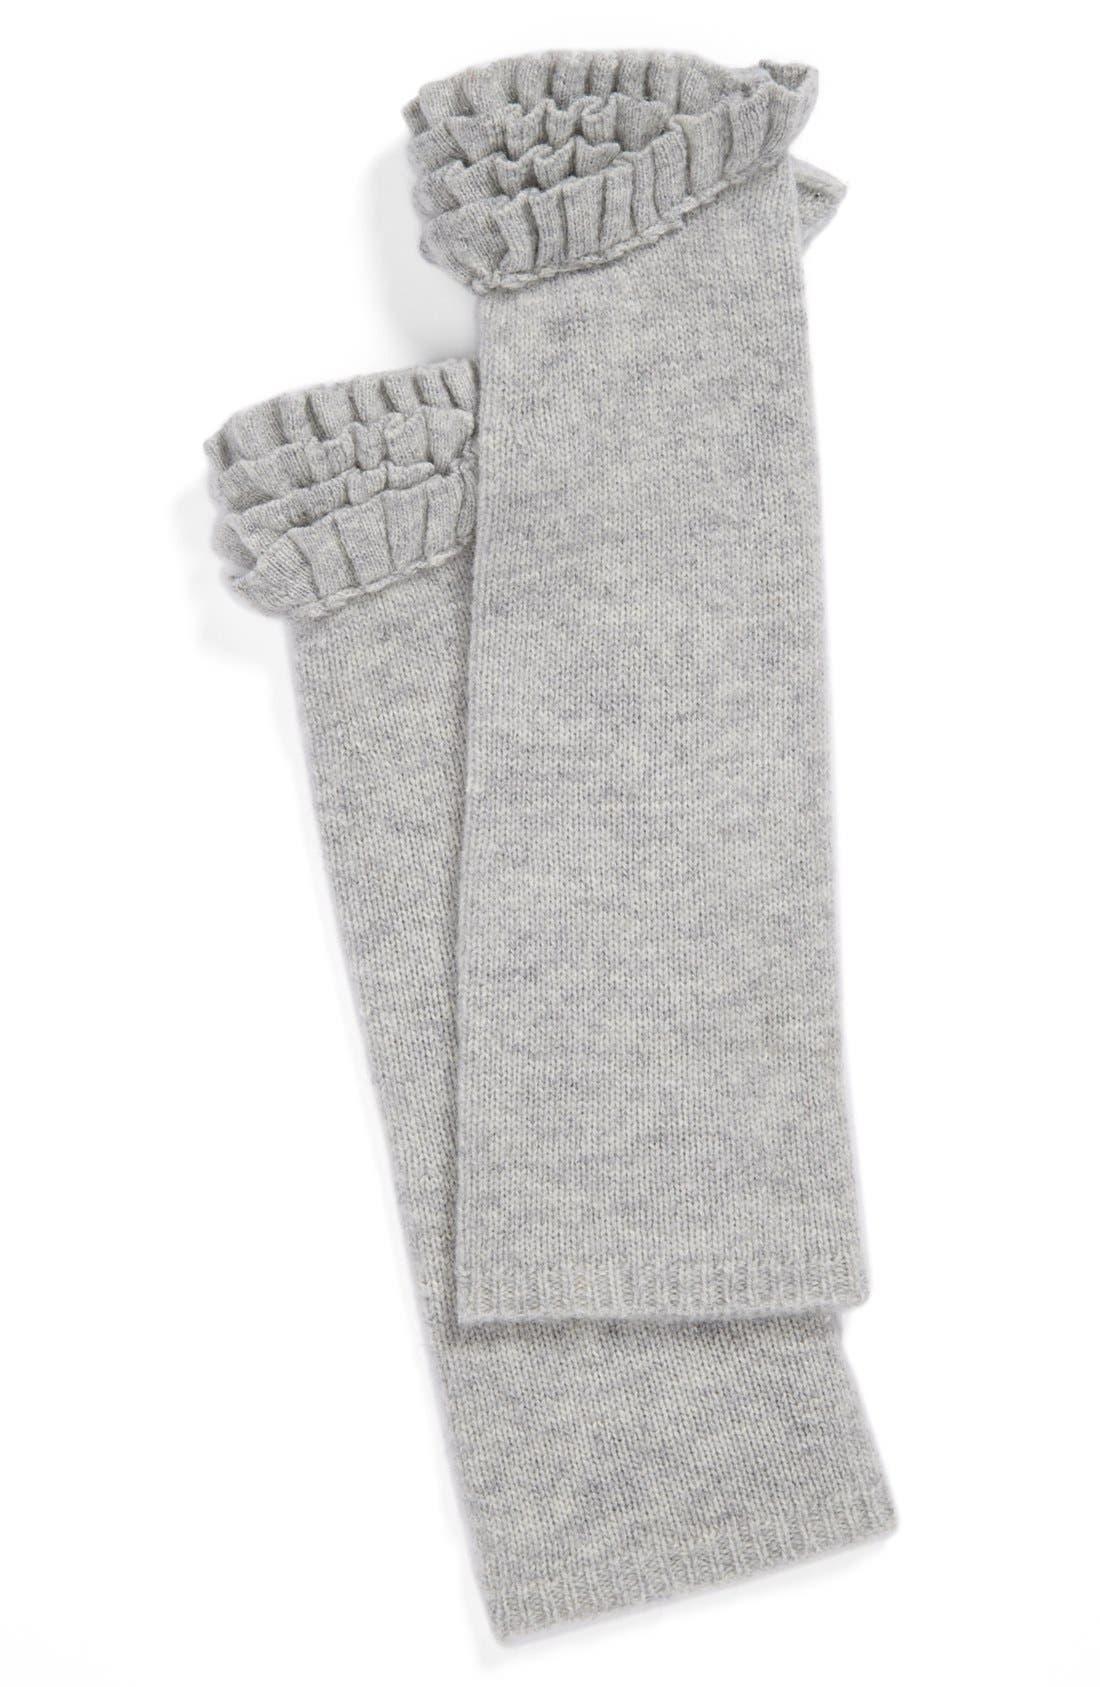 Main Image - Lauren Ralph Lauren 'Victorian Ruffle' Knit Arm Warmers